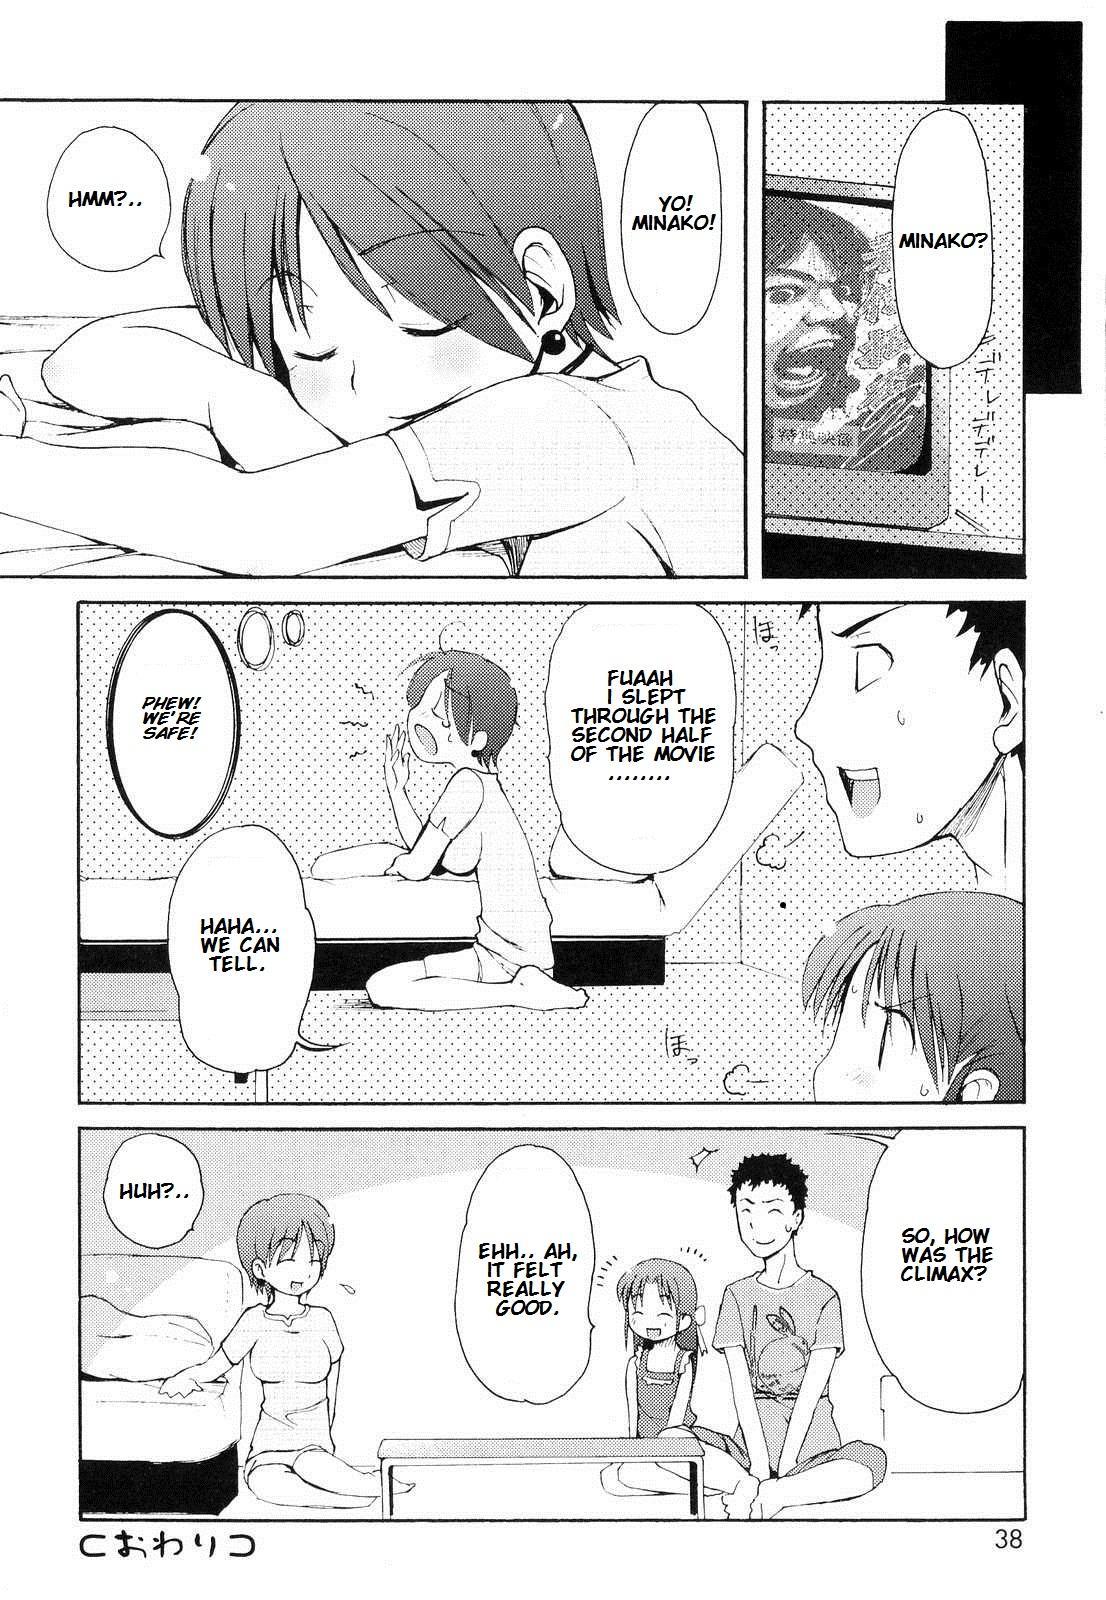 [LEE] Totsugeki Tonari no Onii-chan Ch. 1-7 [ENG] 38